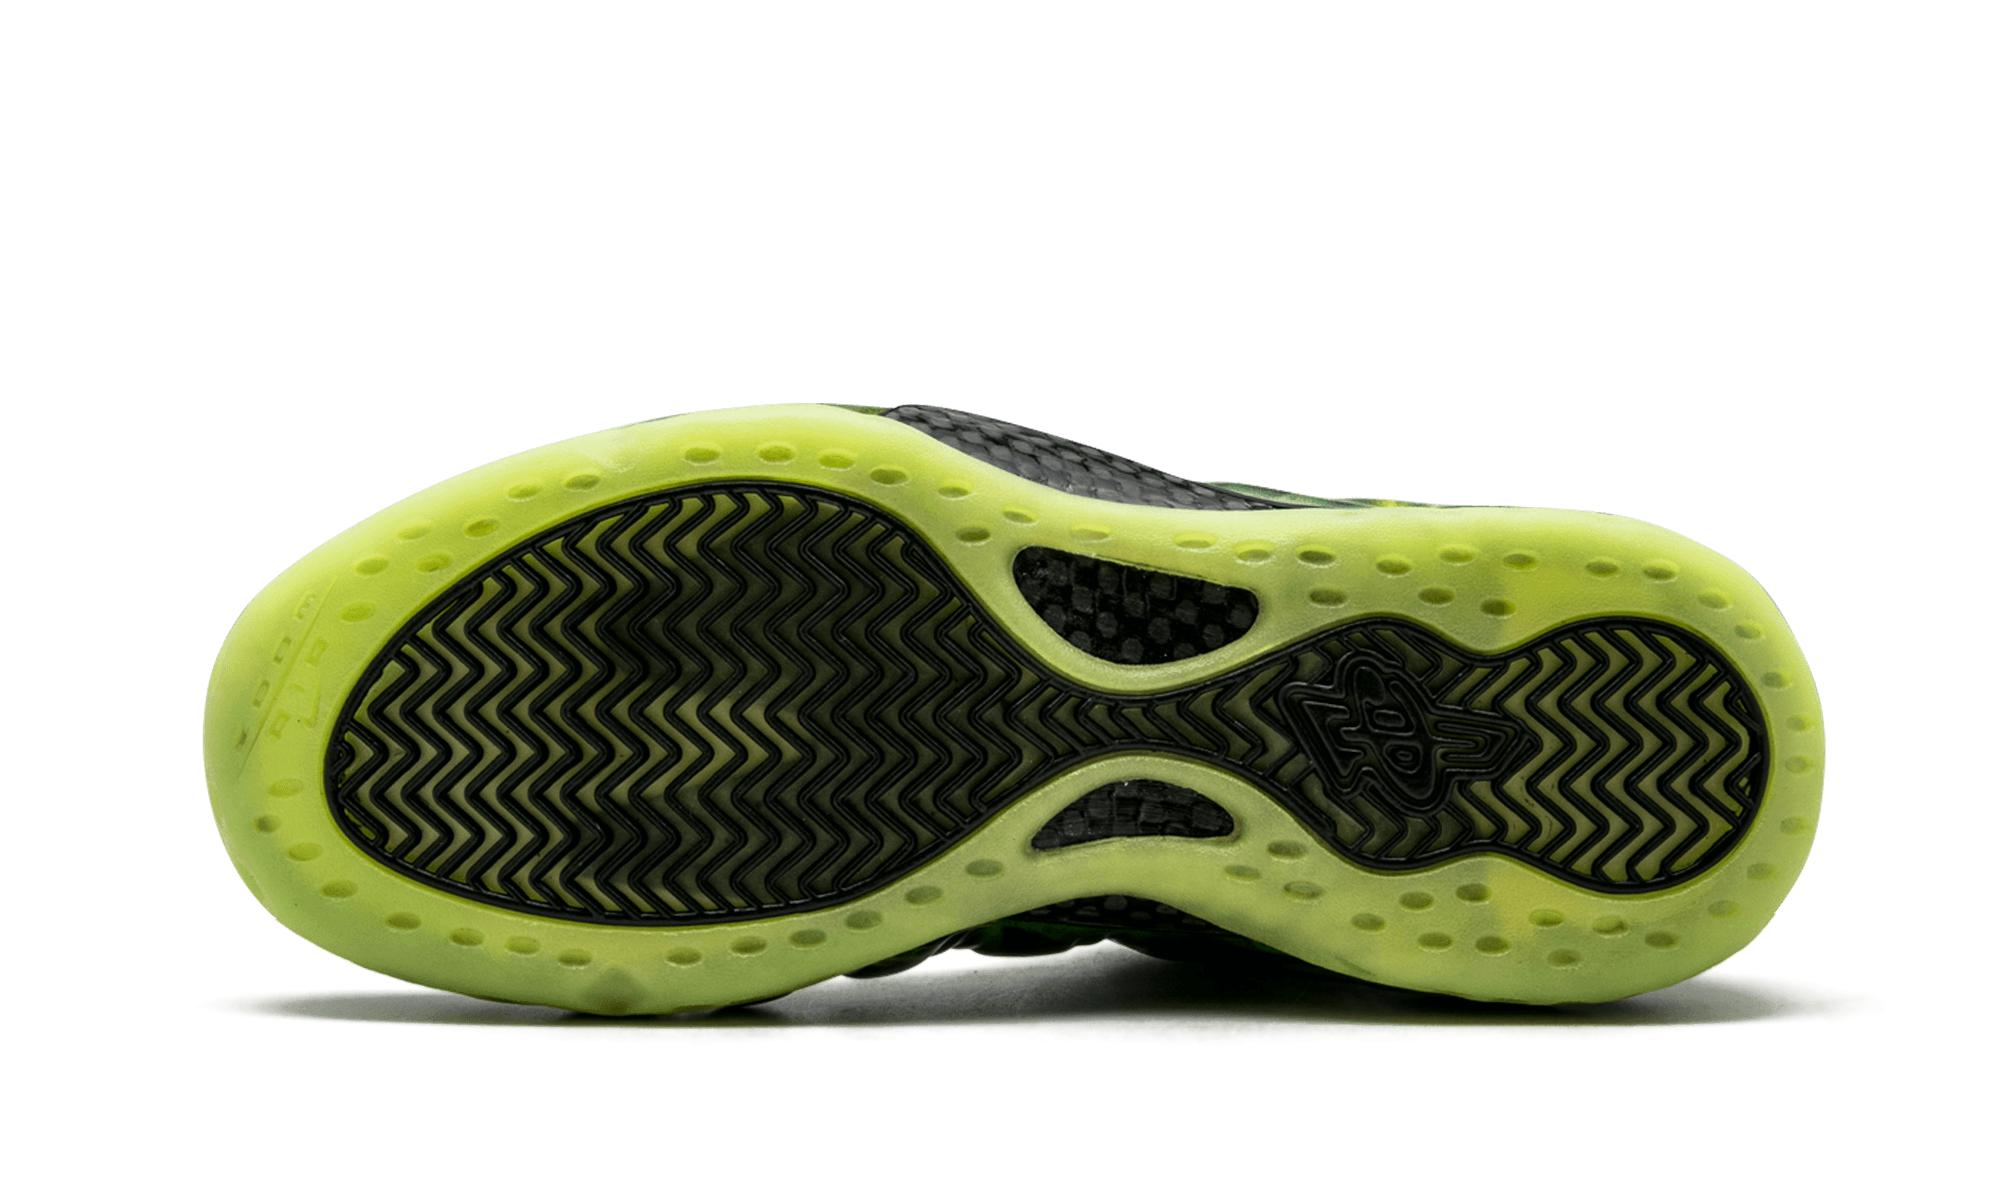 big sale d1df1 dca61 netherlands nike air foamposite one paranorman shoes 48951 4938c  official  view fullscreen de186 94cbe